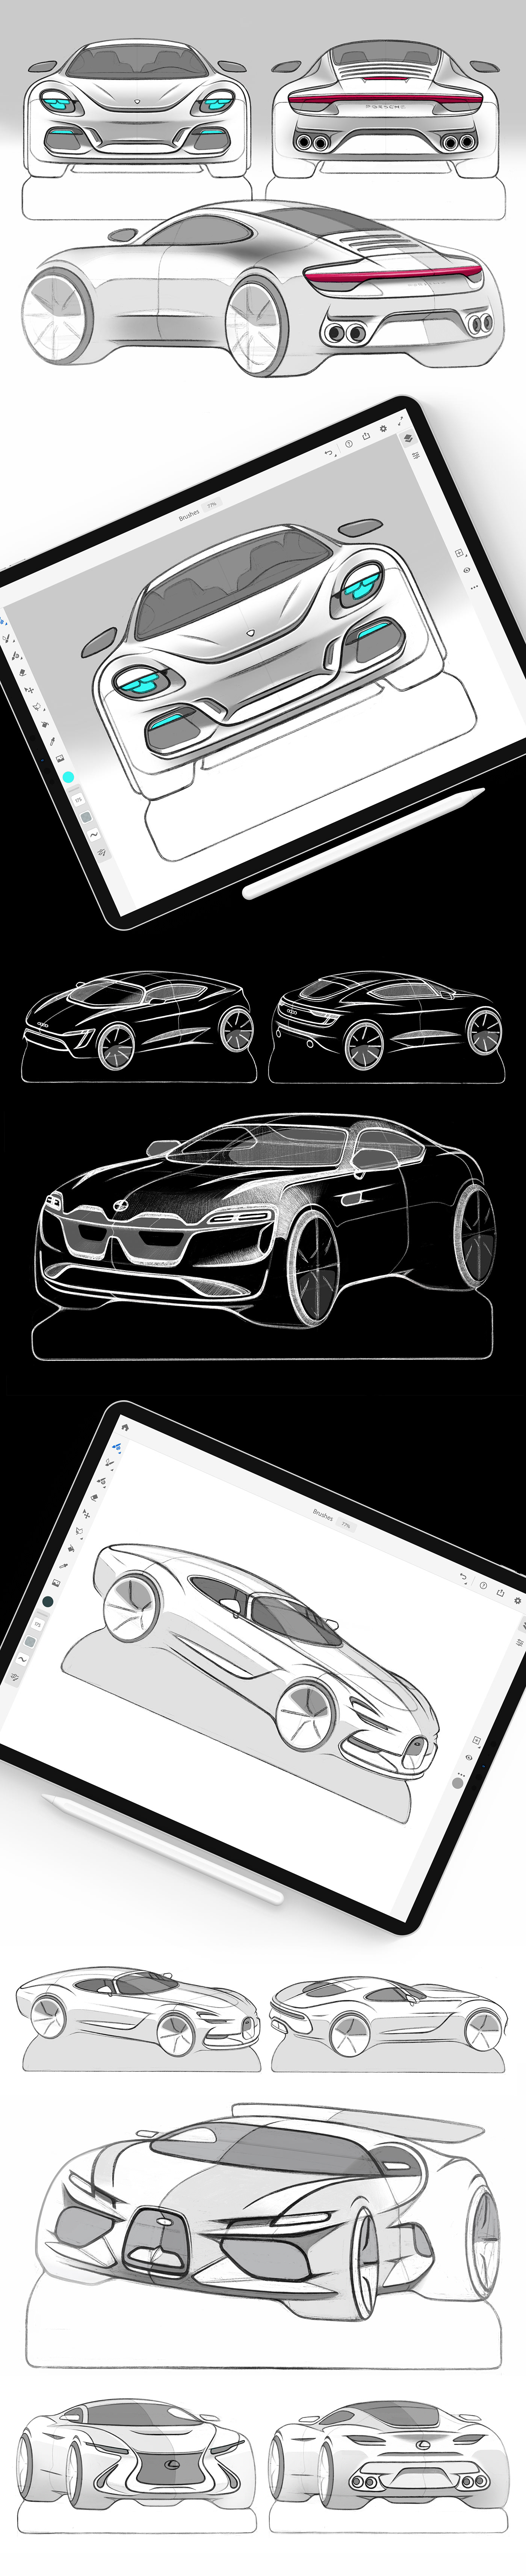 car design car sketches Car Illustration doodle Automotive design ipad pro adobe photoshop fresco Procreate